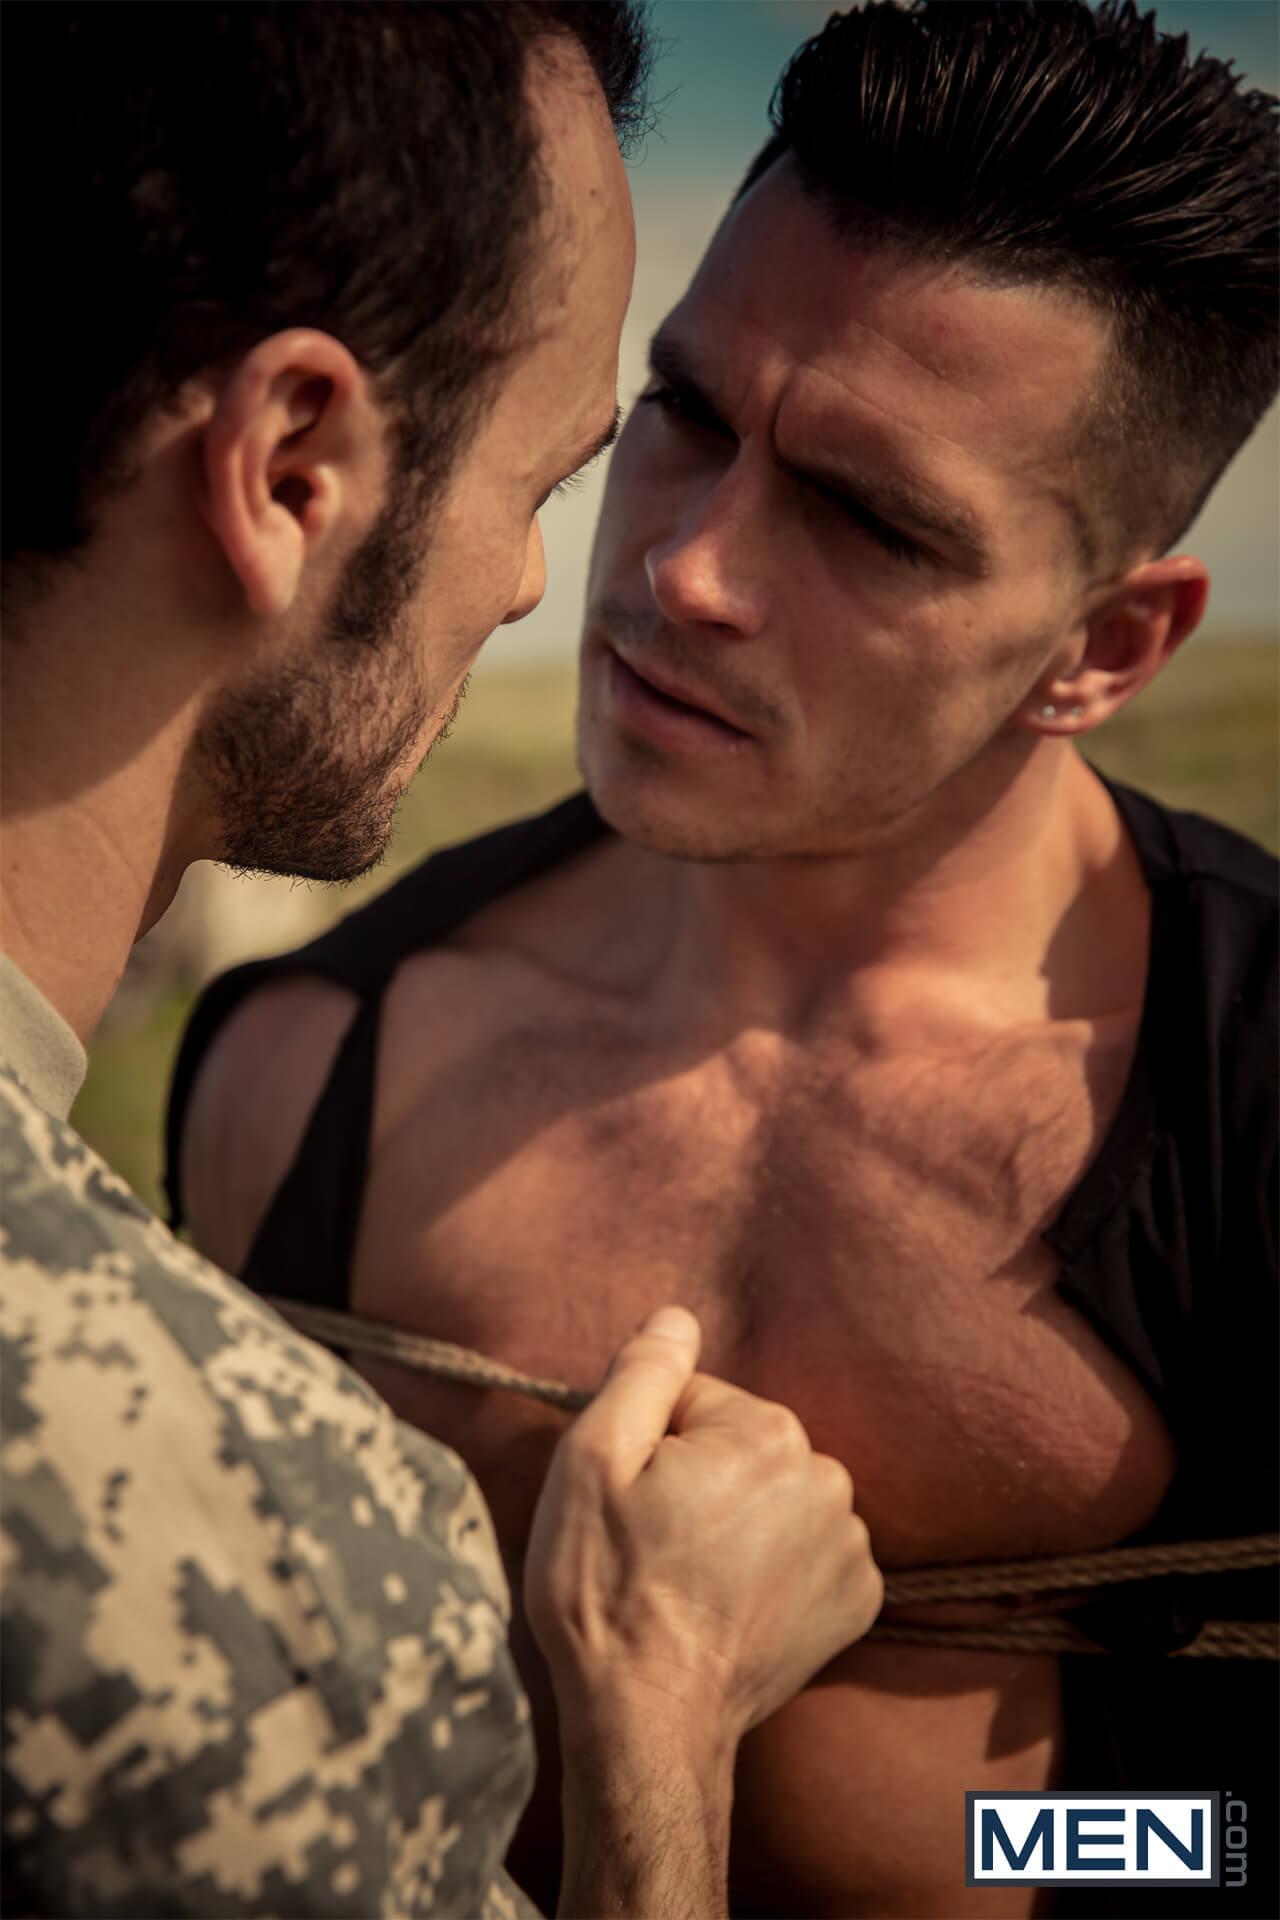 men drill my hole prisoner of war part 3 gabriel vanderloo paddy obrian gay porn blog image 7